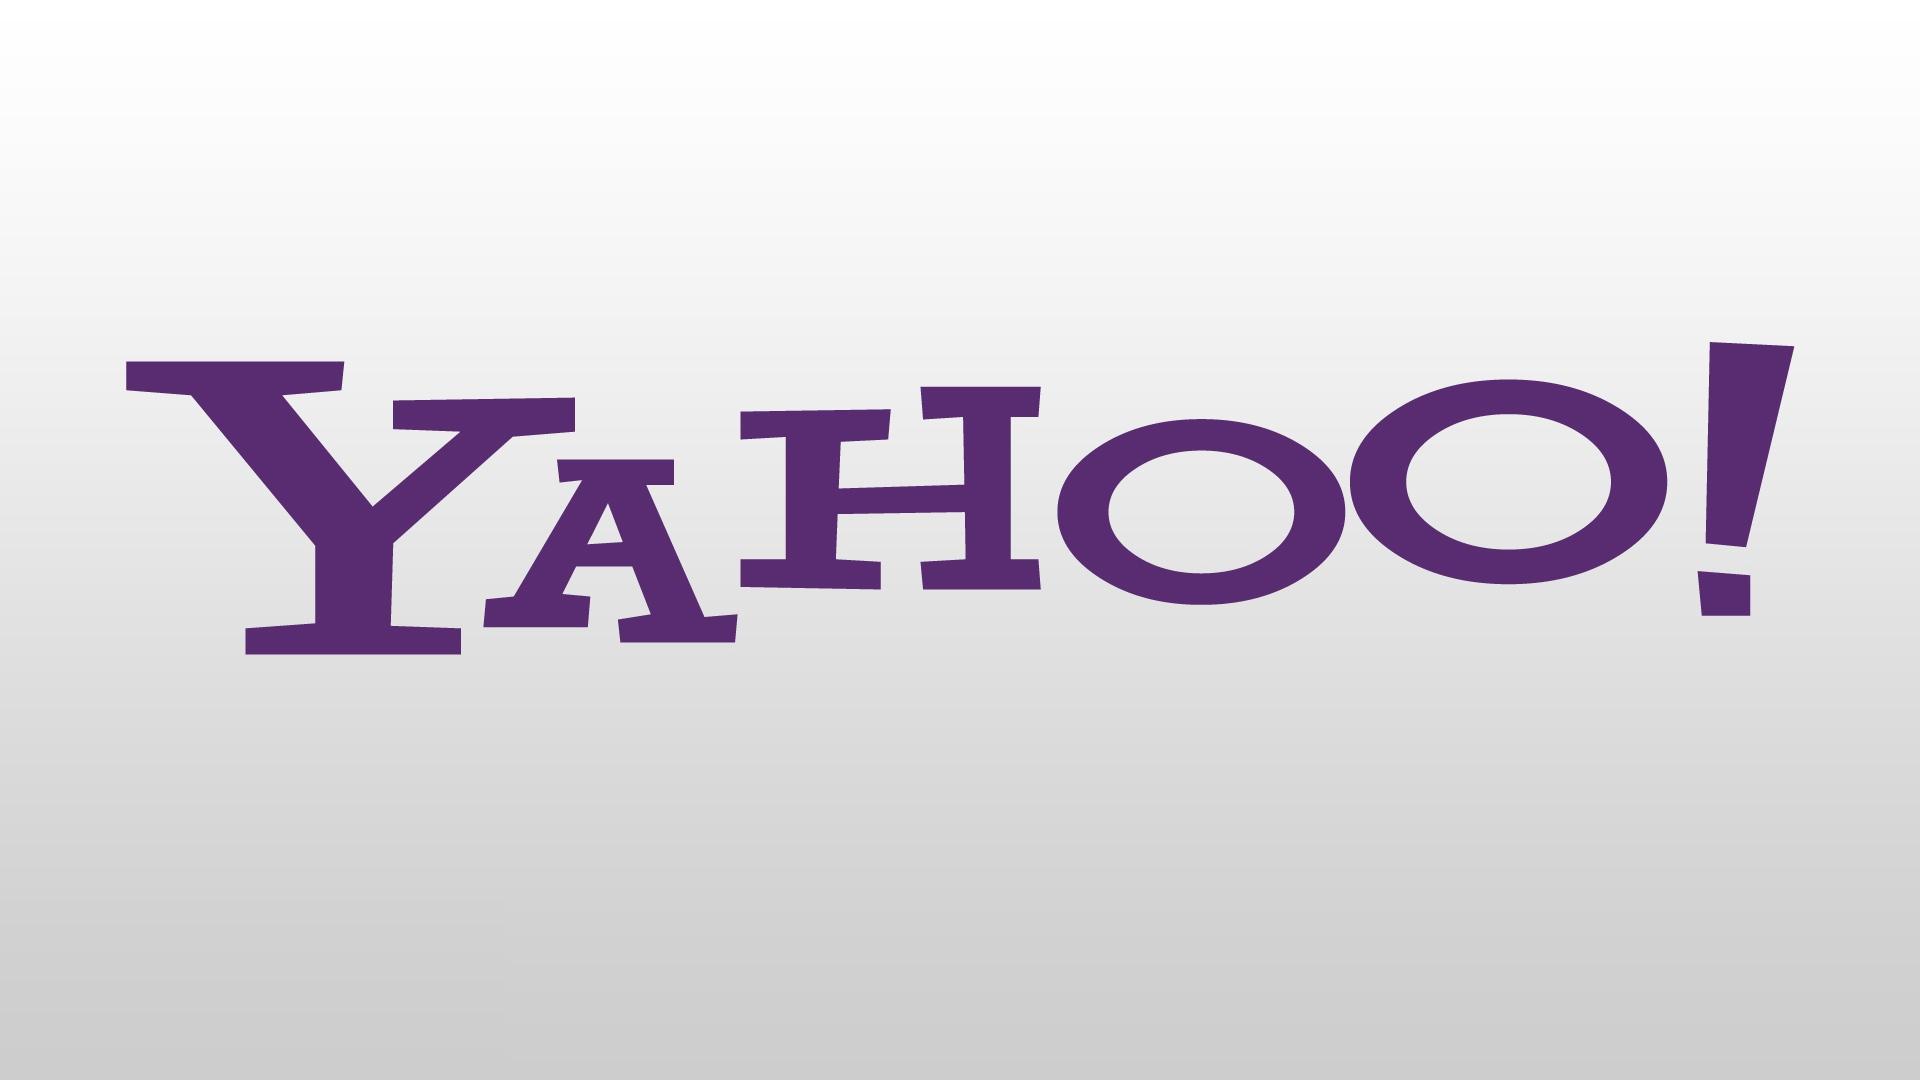 Download wallpaper 1920x1080 yahoo system search purple white 1920x1080